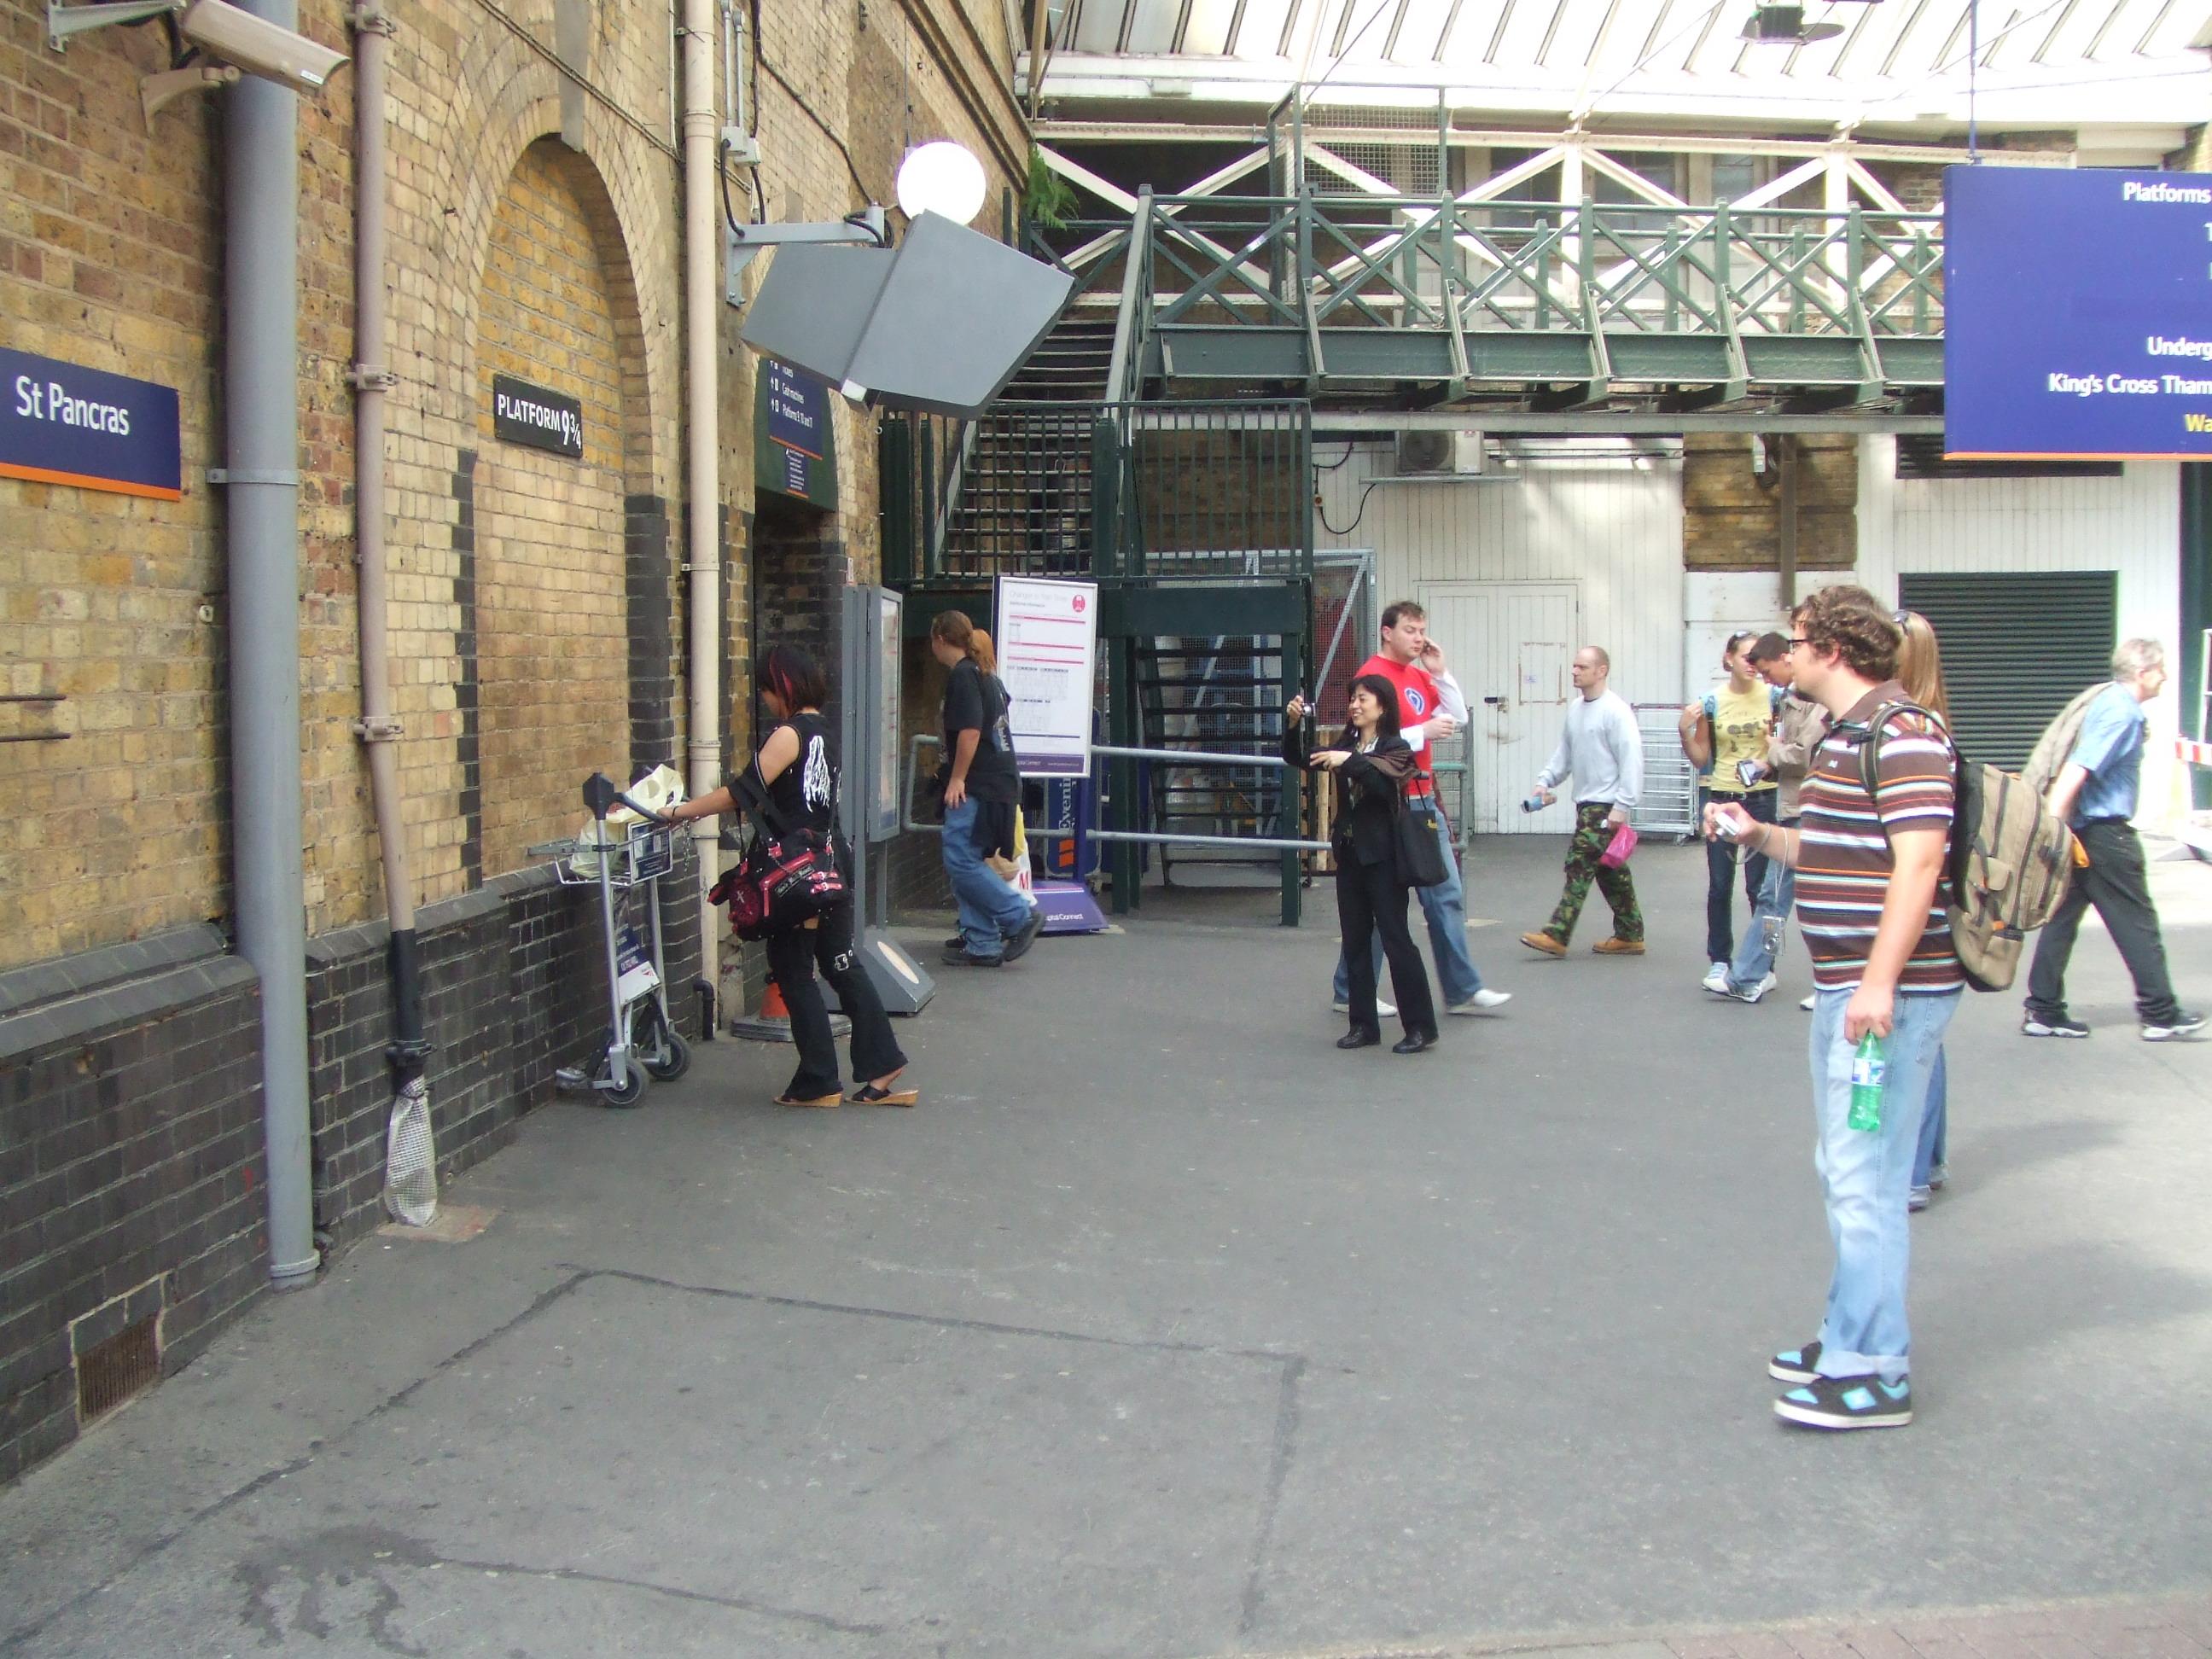 Fileharry Potters Platform 975 At Kings Cross Station